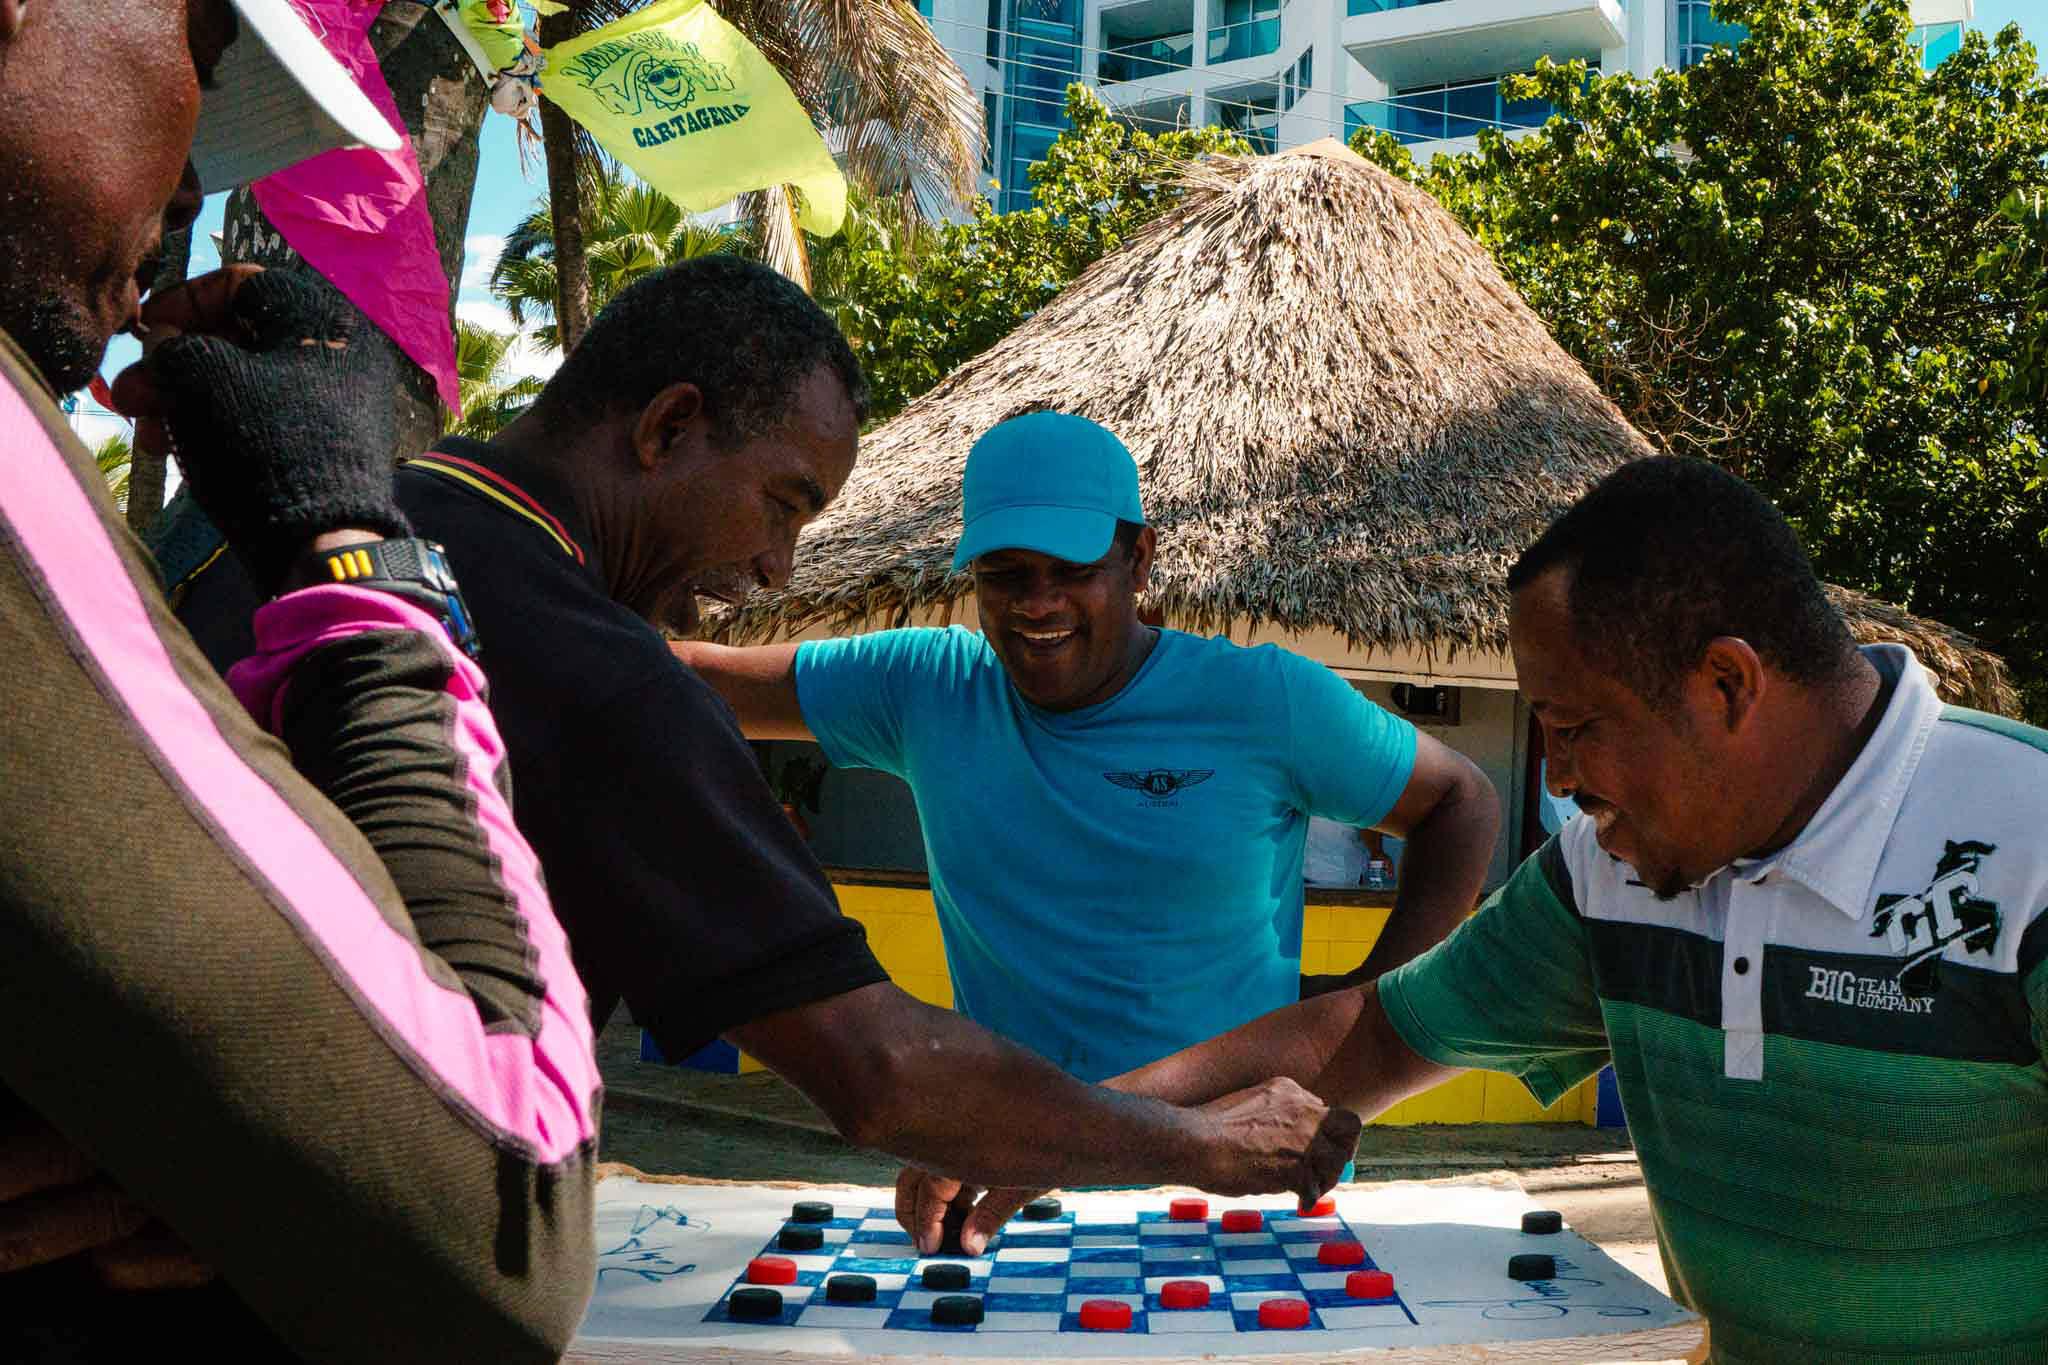 Cartagena street photo